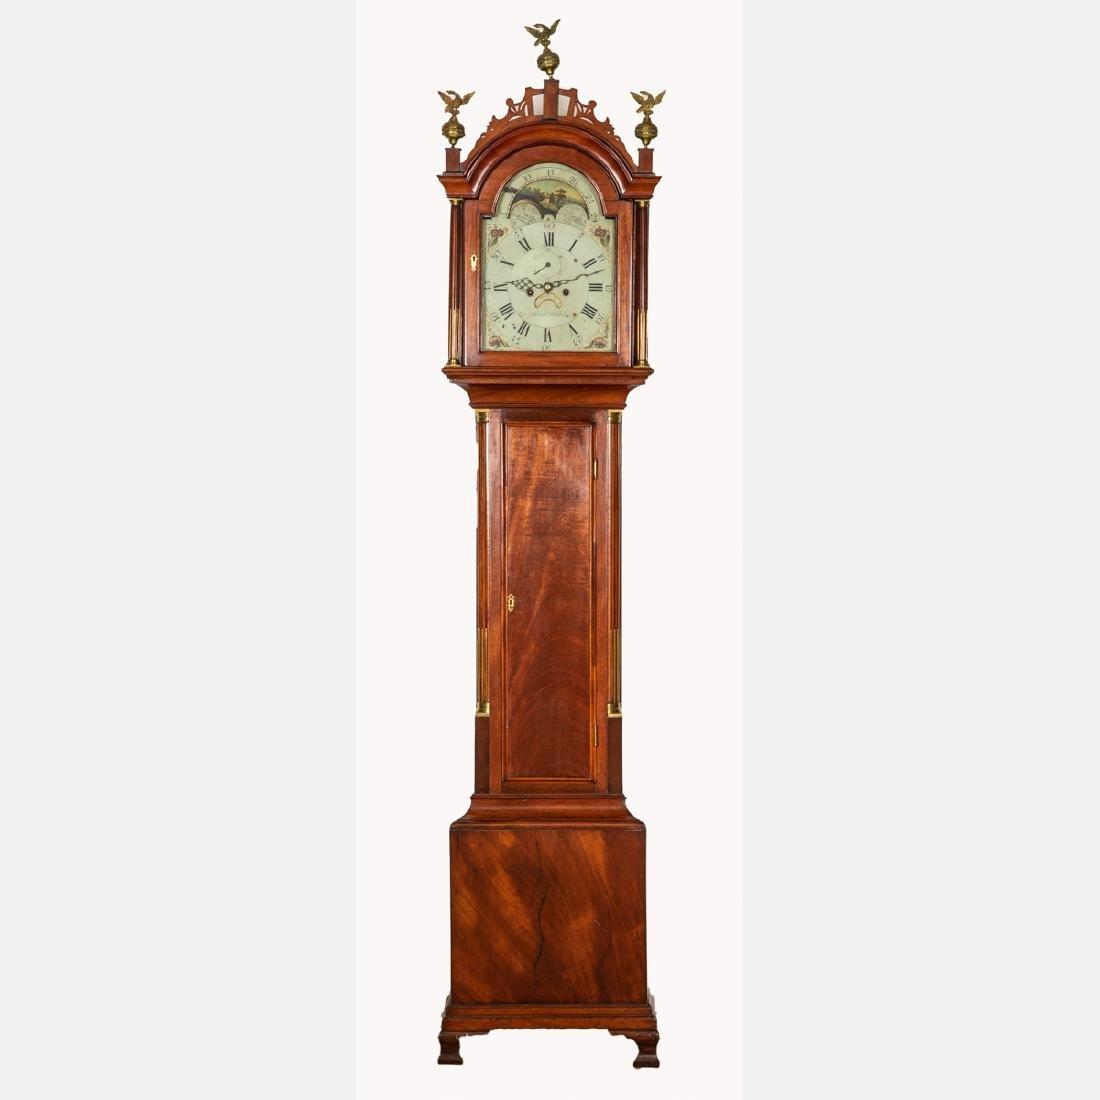 An American Mahogany Tall Case Clock by Simon Willard,